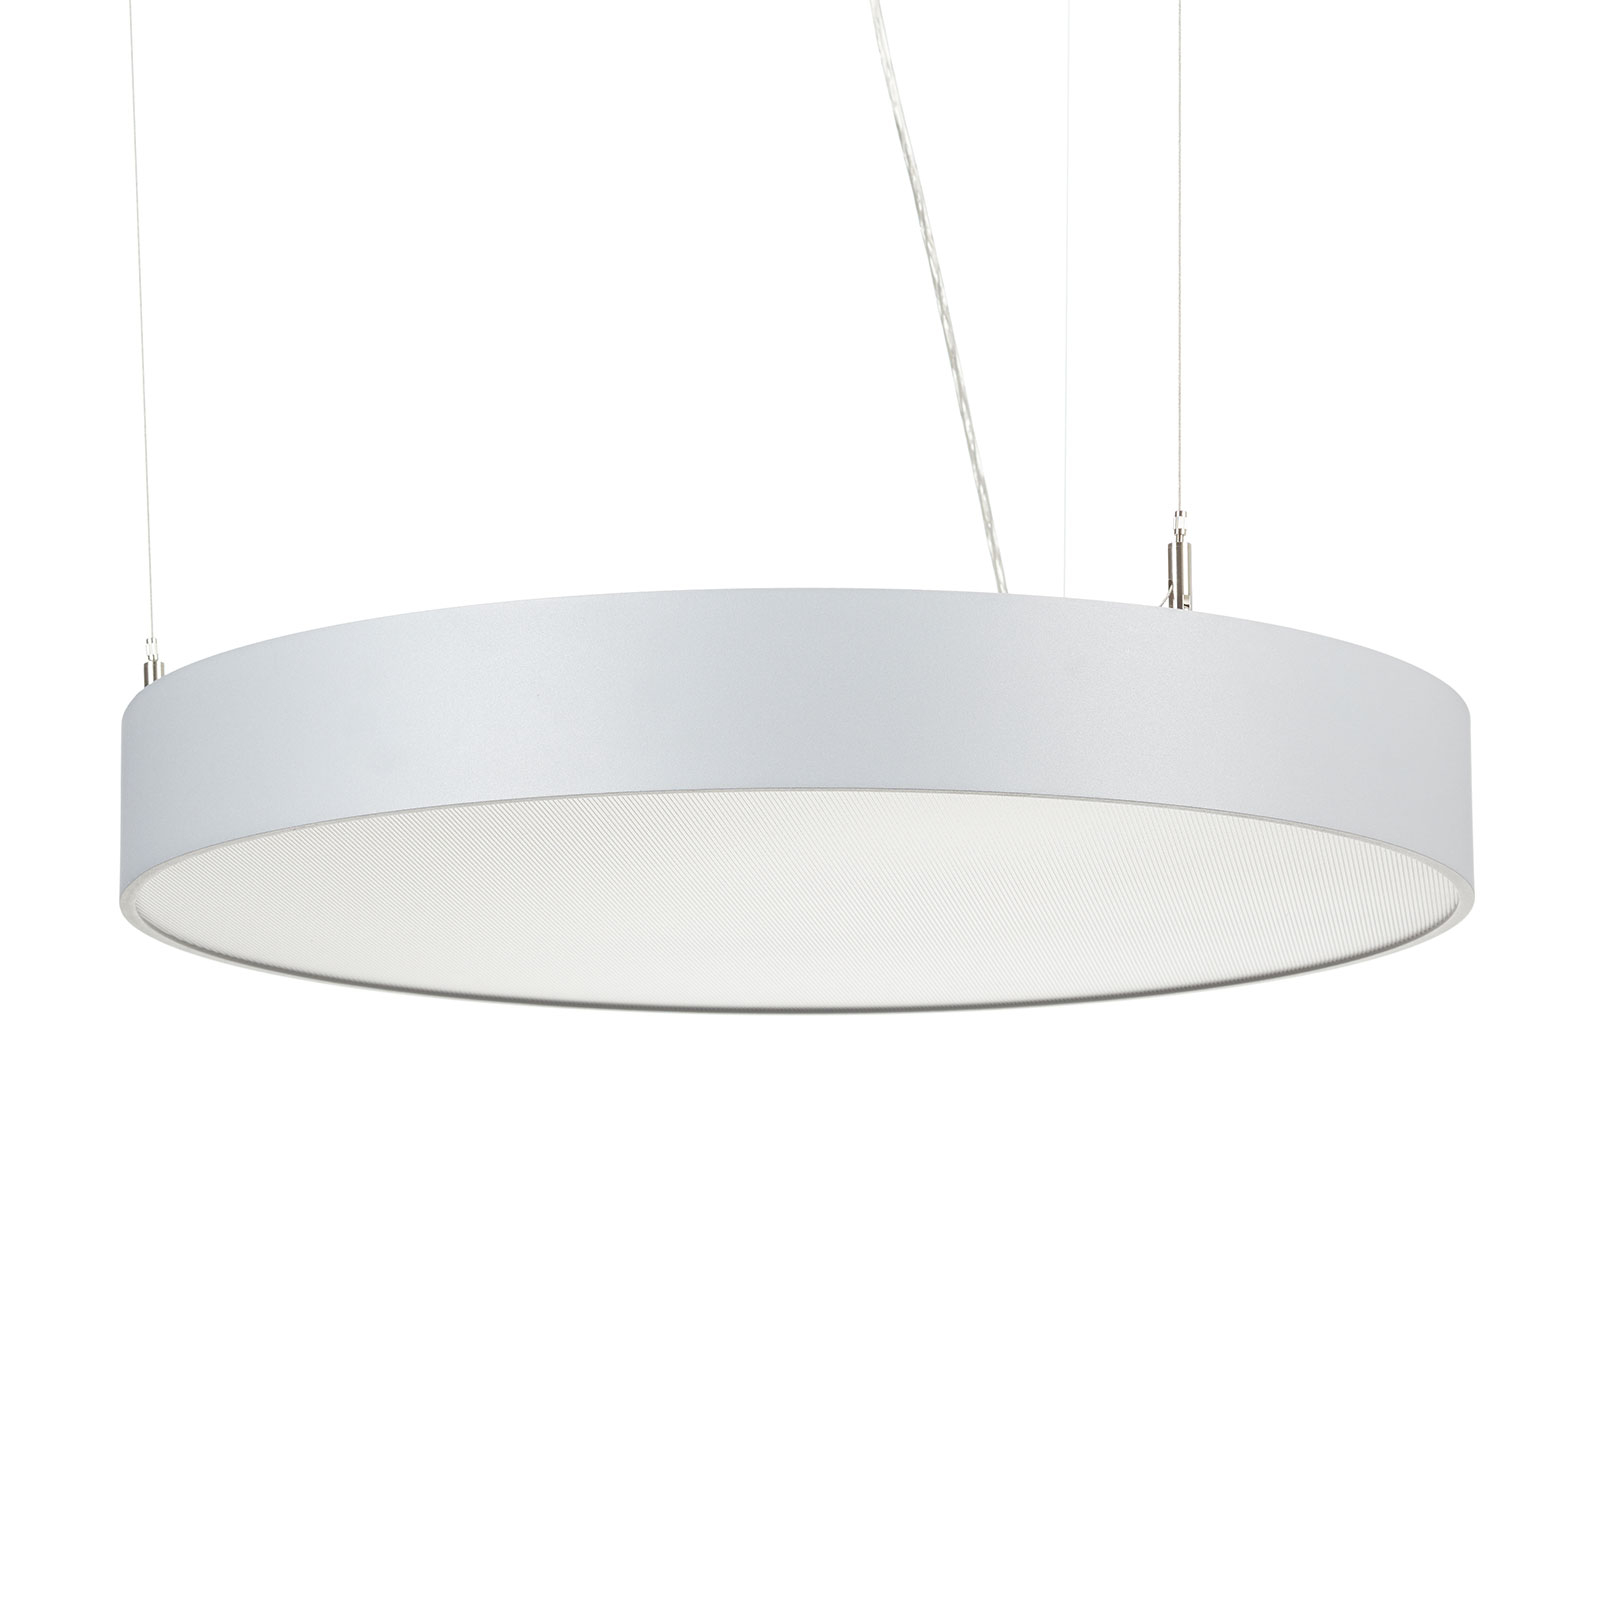 Arcchio Lio lampa wisząca LED 4000K 60cm